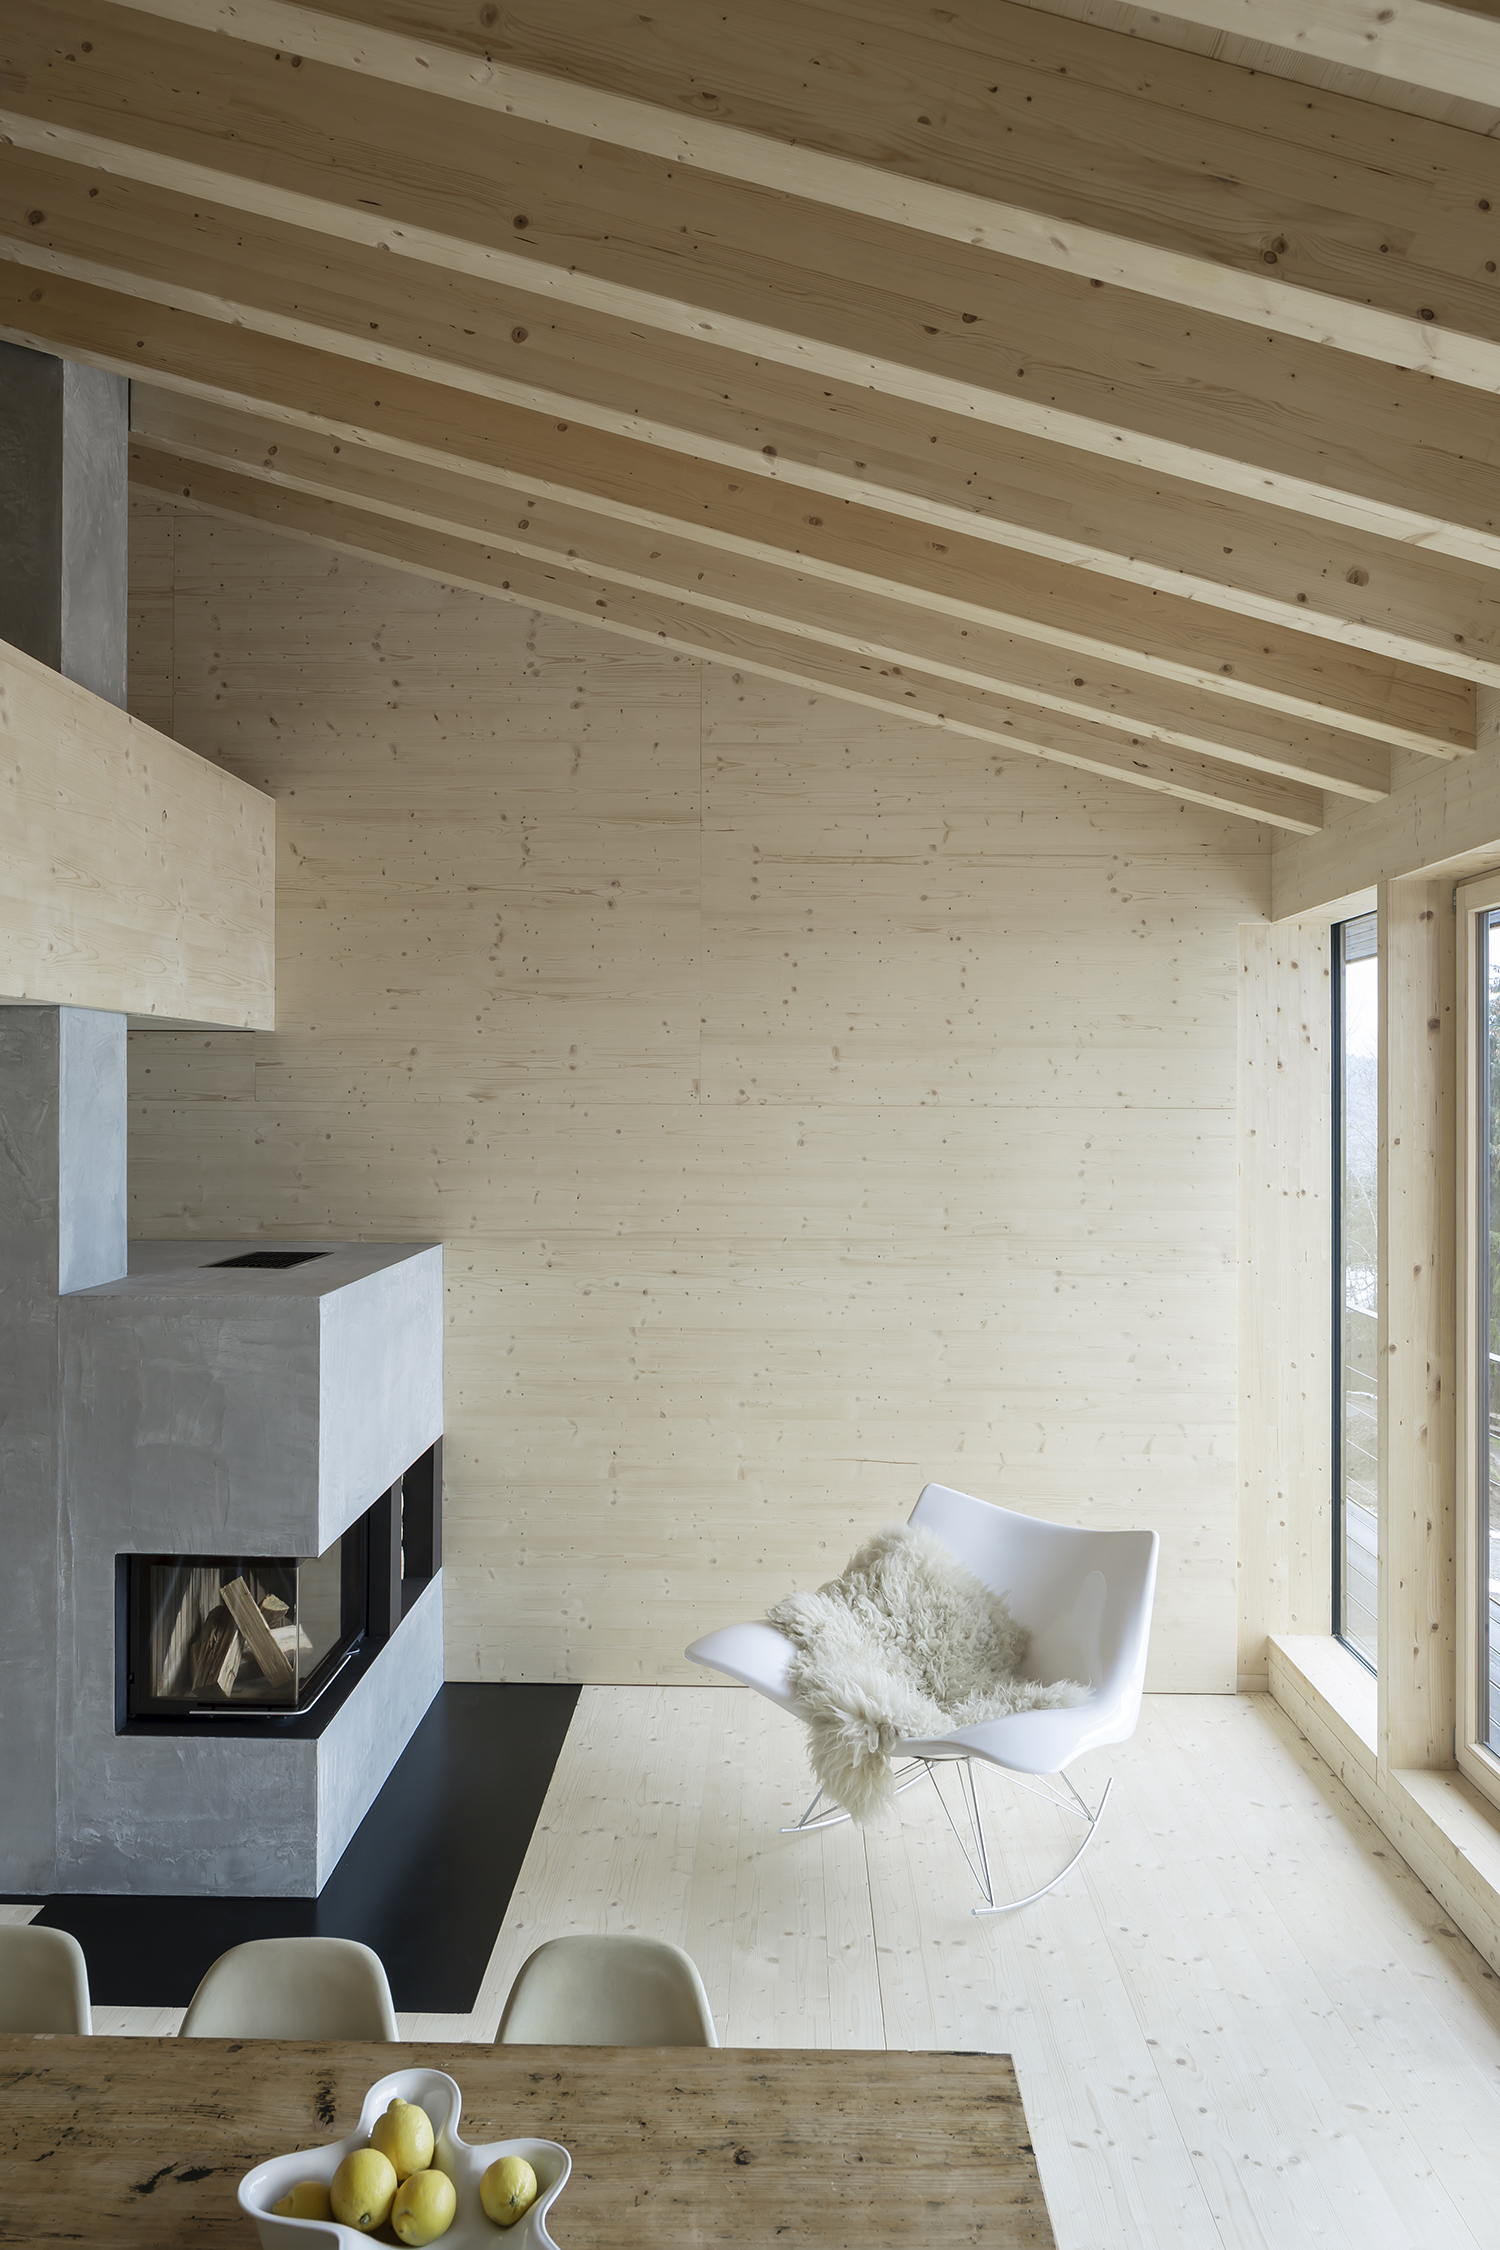 gallery of house p yonder architektur und design 5. Black Bedroom Furniture Sets. Home Design Ideas